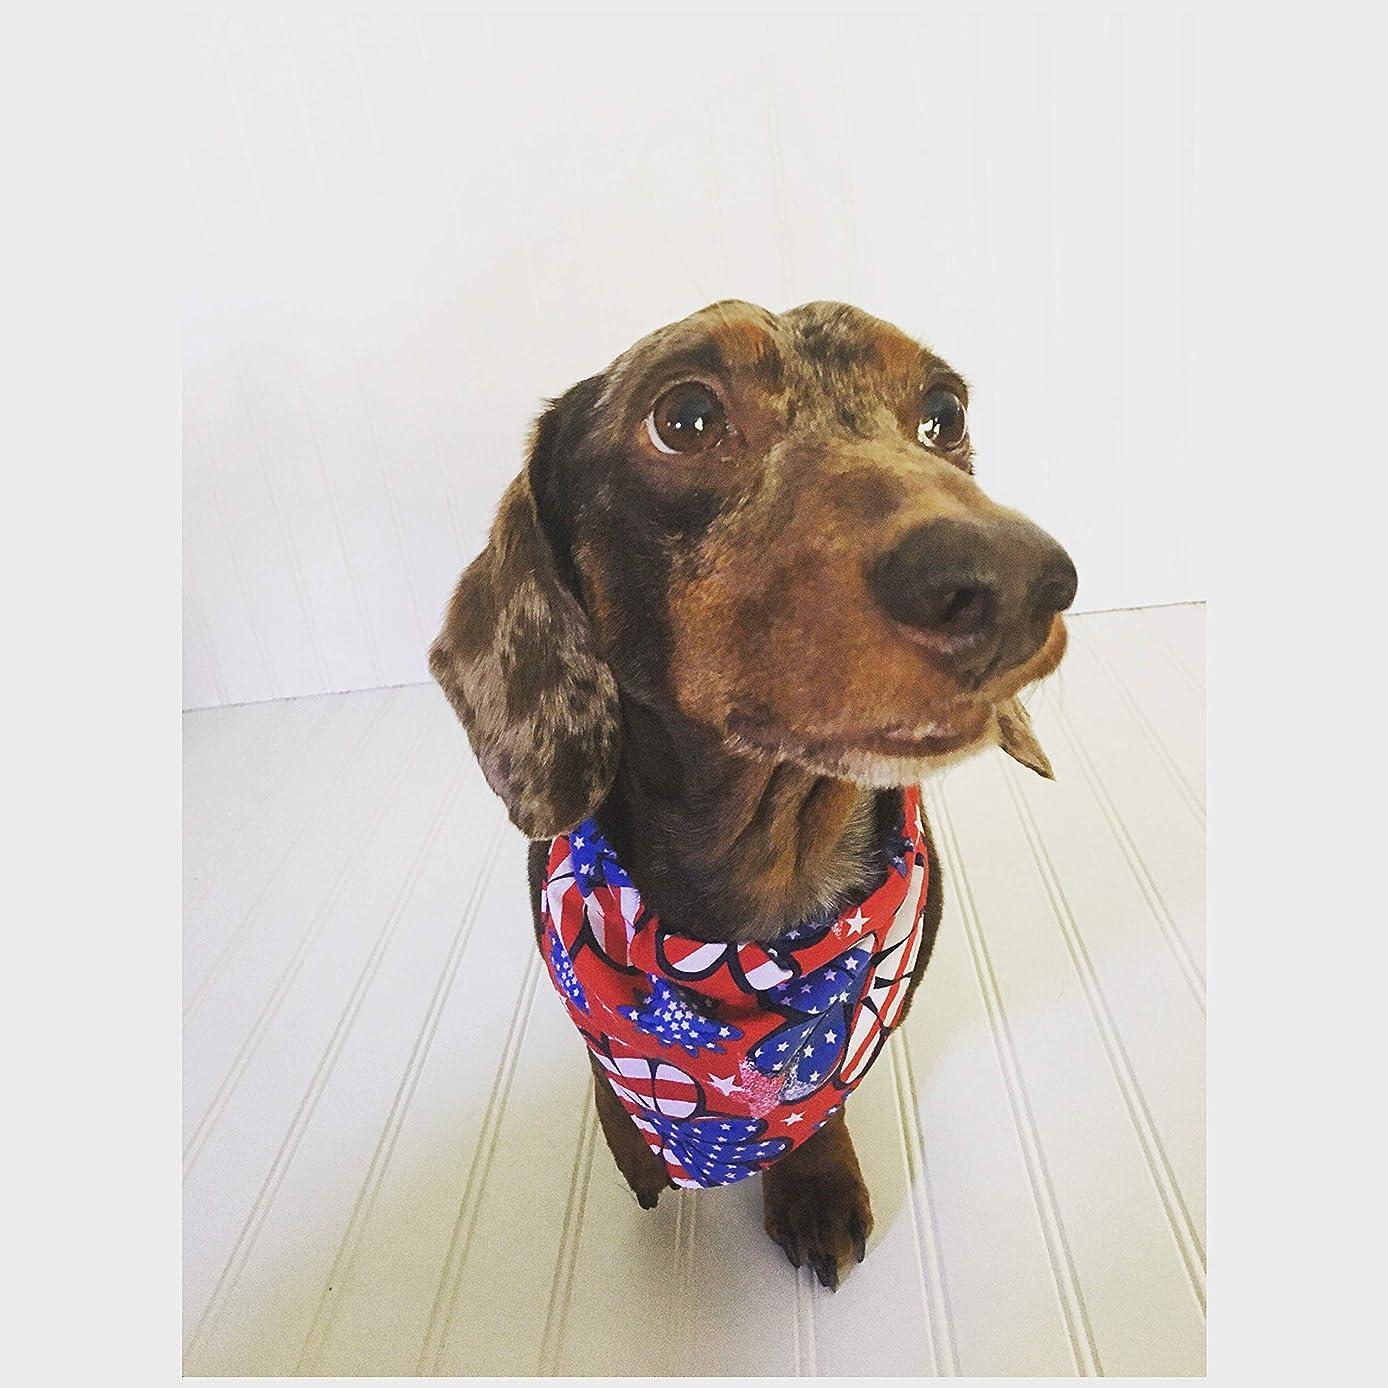 Miniature Dachshund Scarf Dachshund Clothes Dachshund Pajamas Memorial Dog Clothes Stars & Stripes Small Dog Neckware